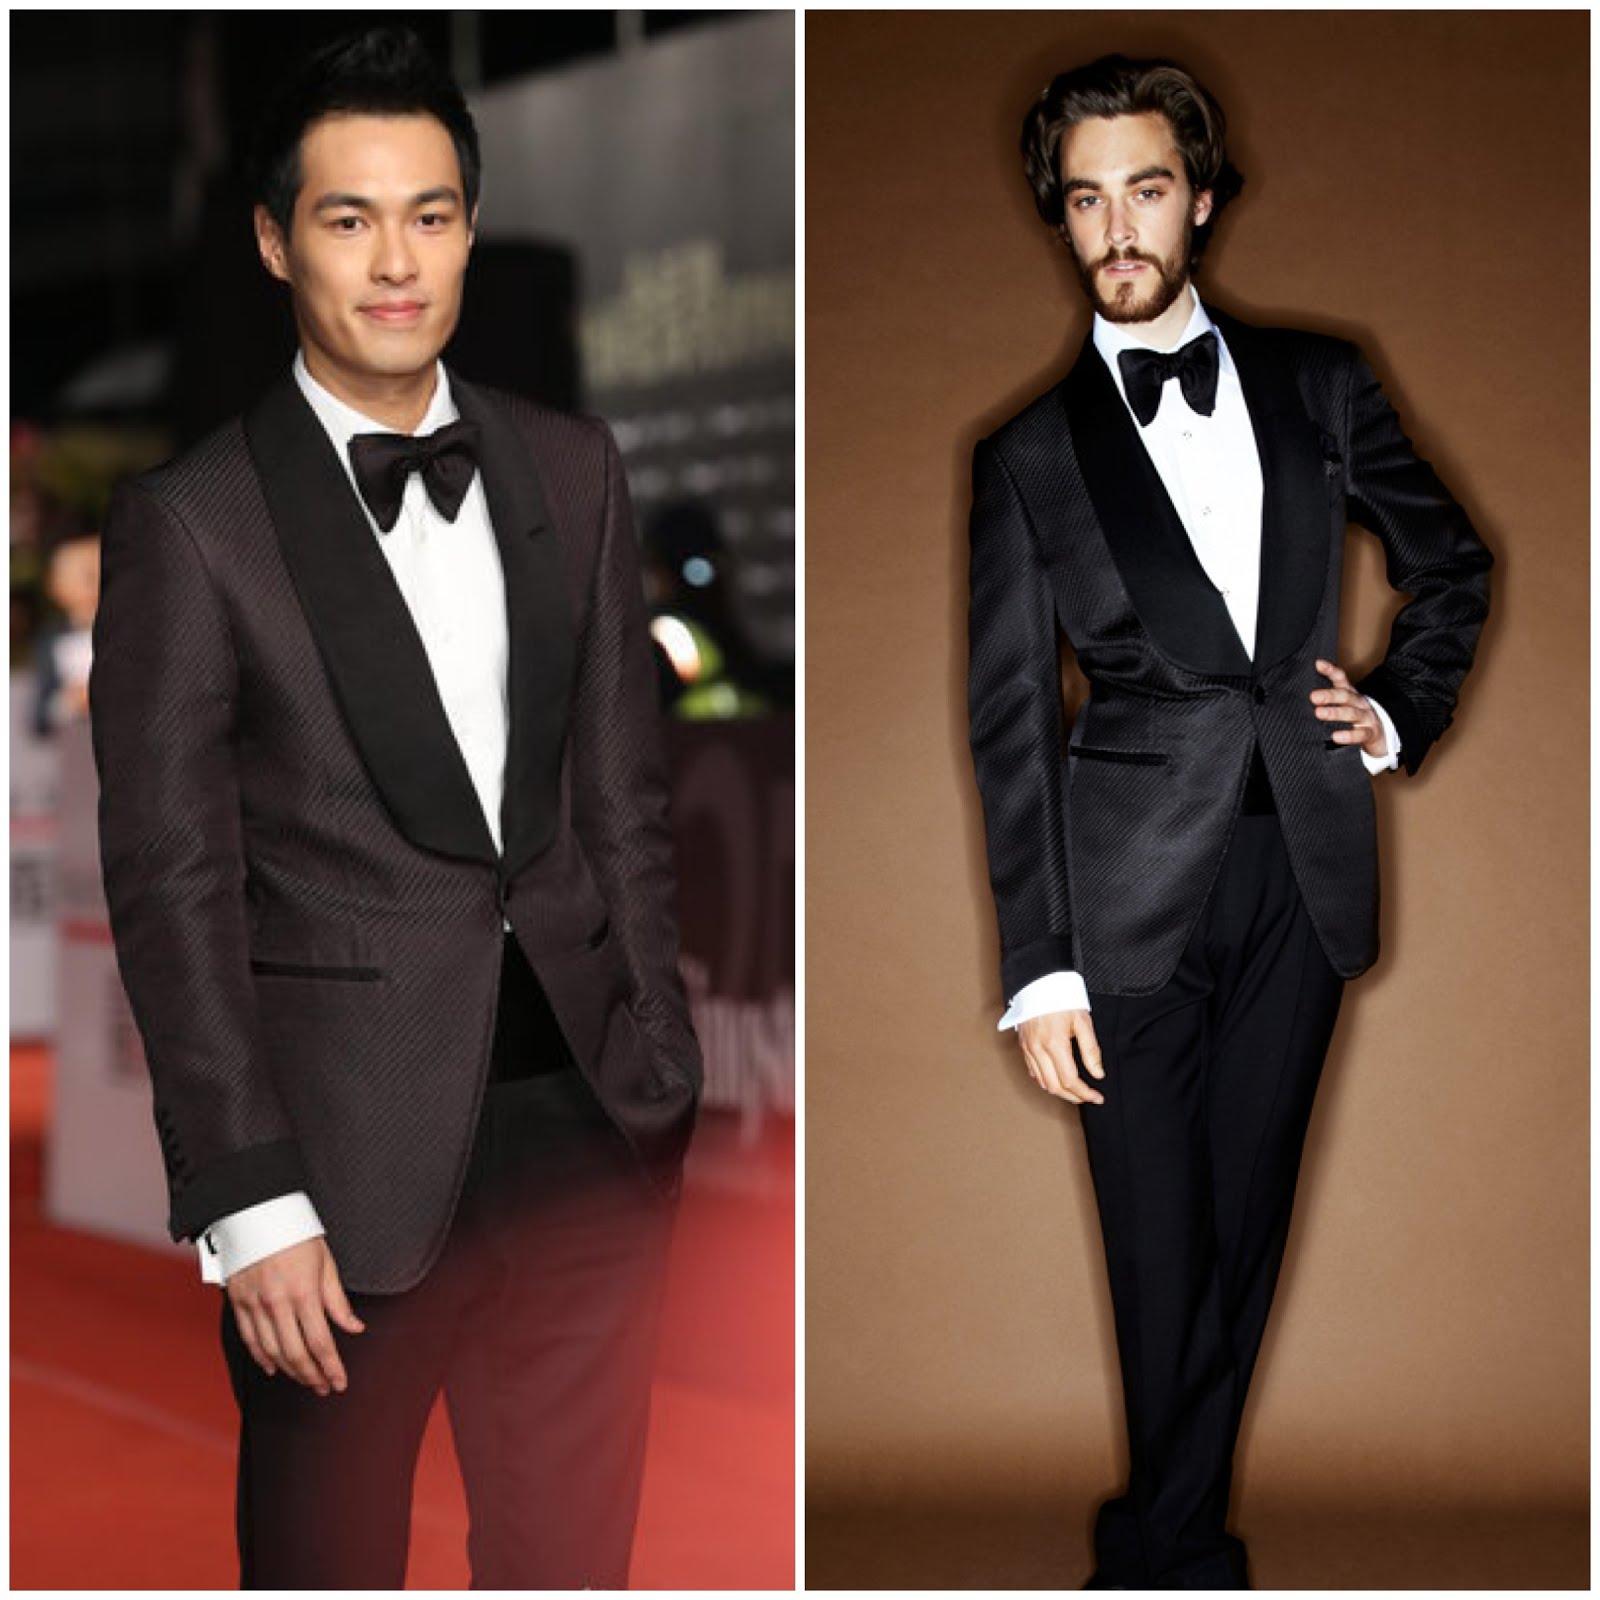 00O00 London Menswear Blog Celebrity Style Tony Yang in Tom Ford - 49th Golden Horse Awards [杨佑宁盛装出席第49届台湾电影金马奖颁奖礼, 身穿汤姆福特晚礼服]